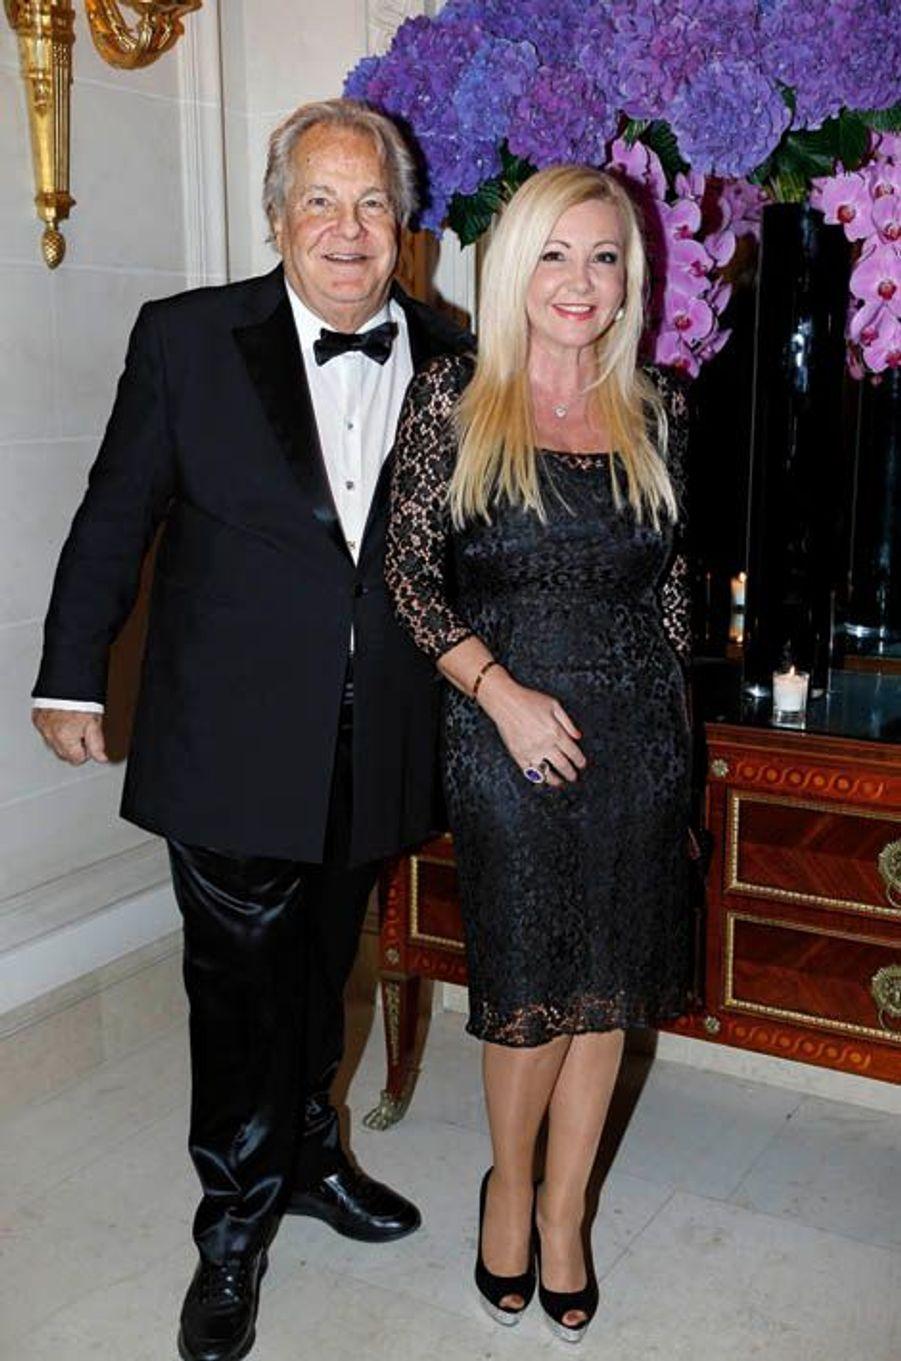 Massimo Gargia et lady Monika Bacardi, généreuse donatrice.